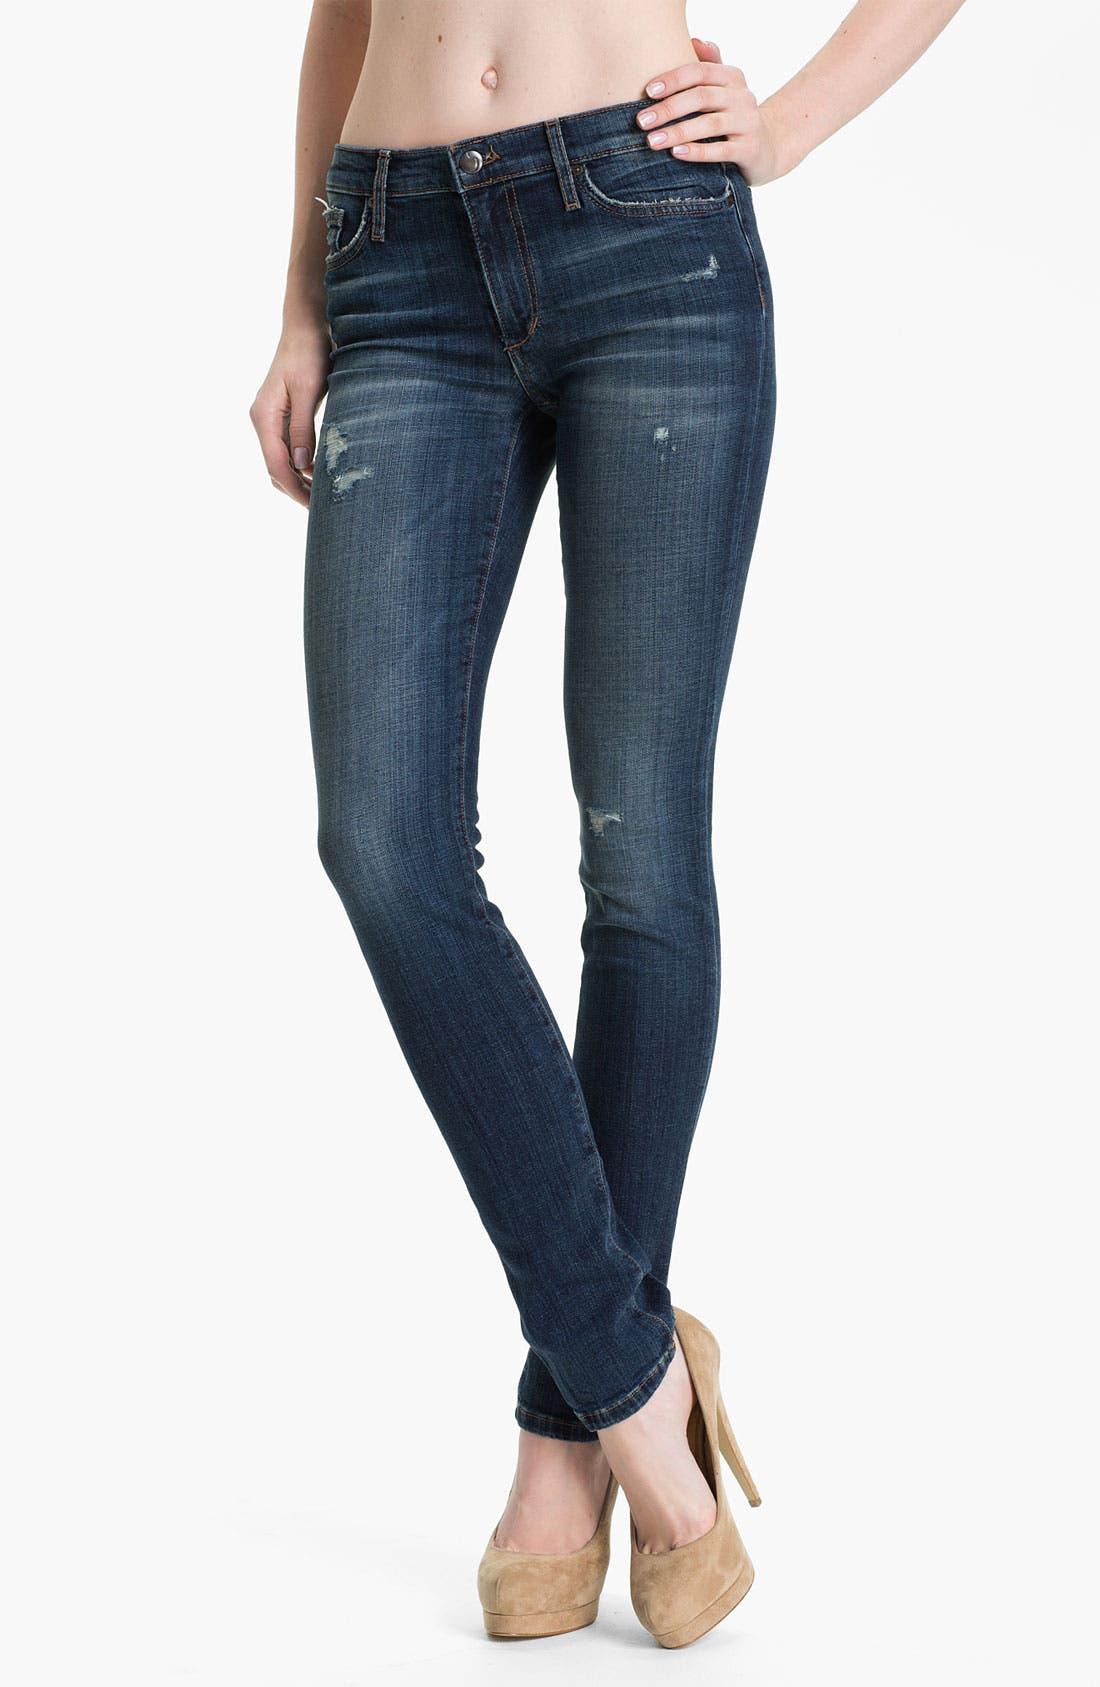 Alternate Image 1 Selected - Joe's Skinny Stretch Jeans (Gerri)